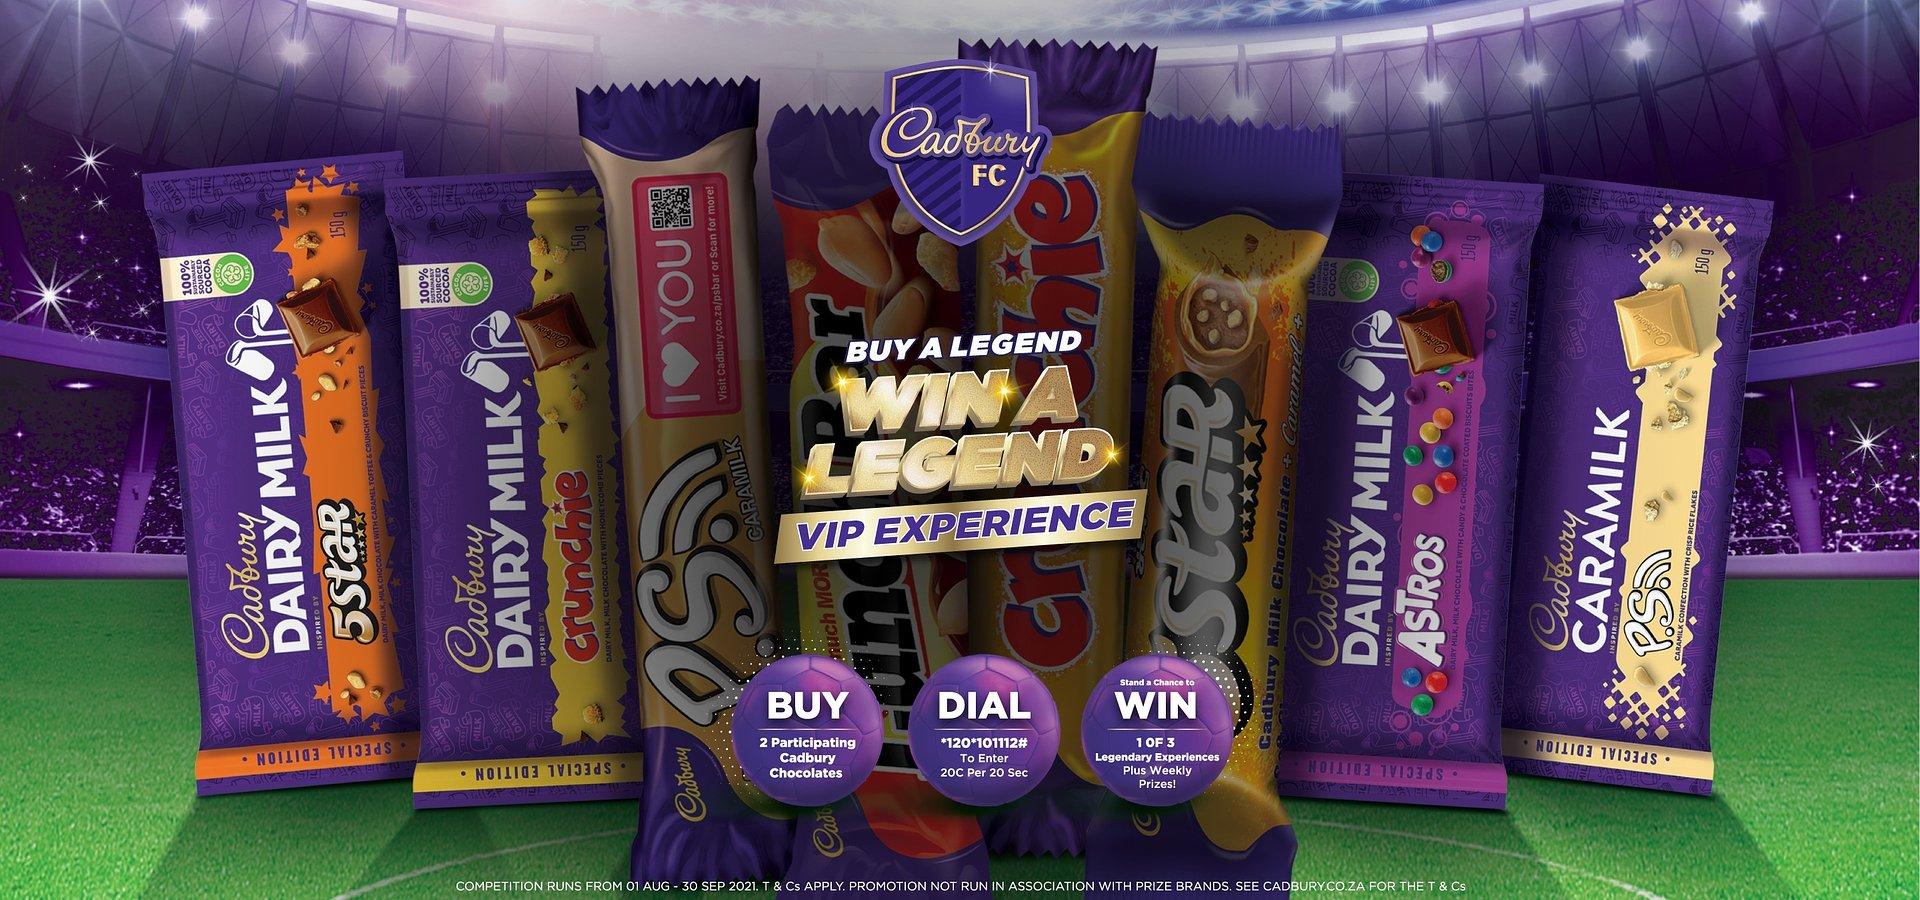 #TasteTheAction With Cadbury's Legendary VIP Experiences